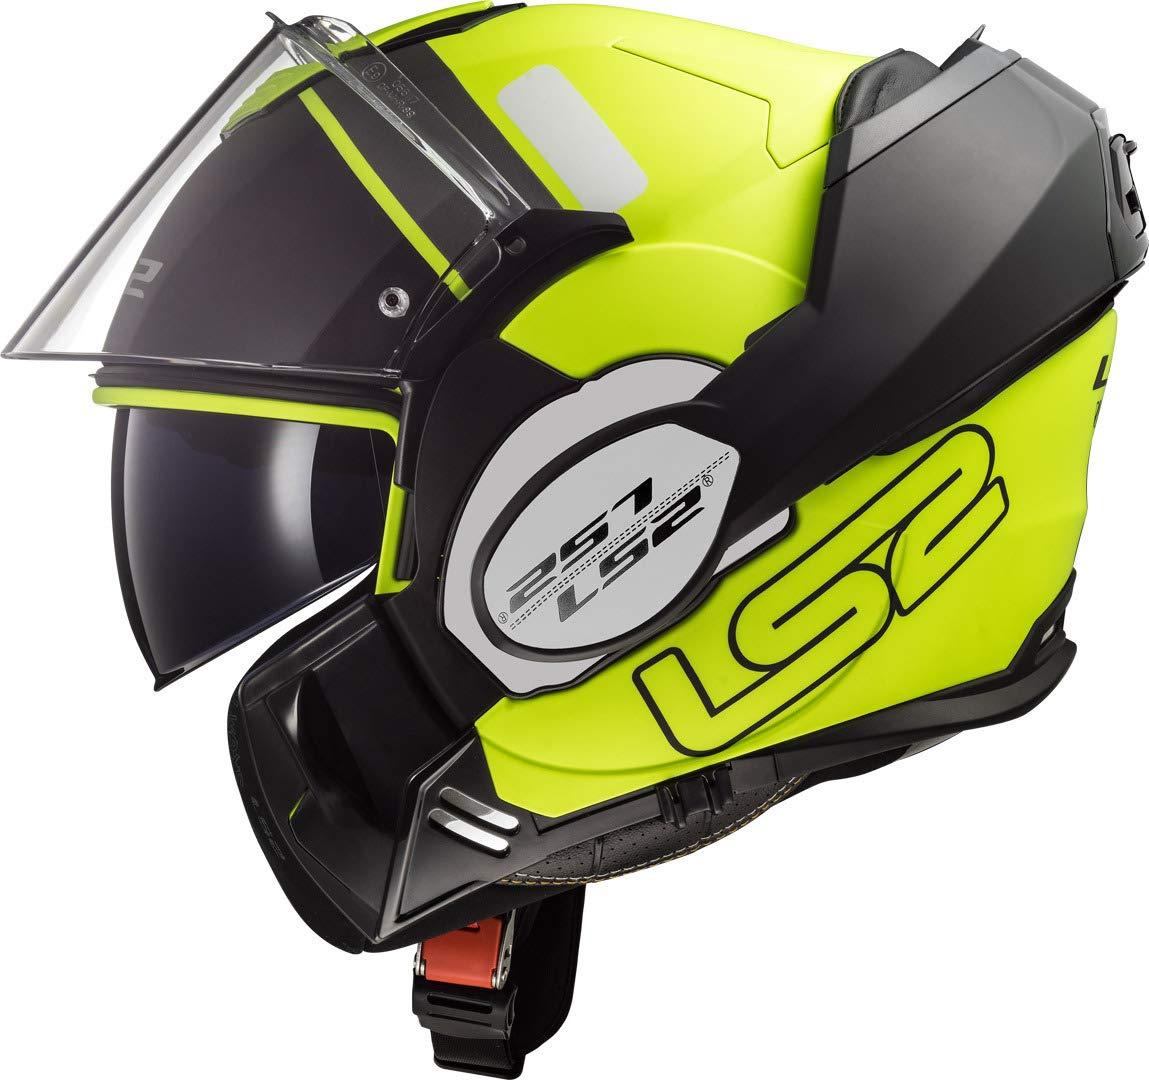 titanio S LS2 Casco de moto FF399 VALIANT PROX negro mate